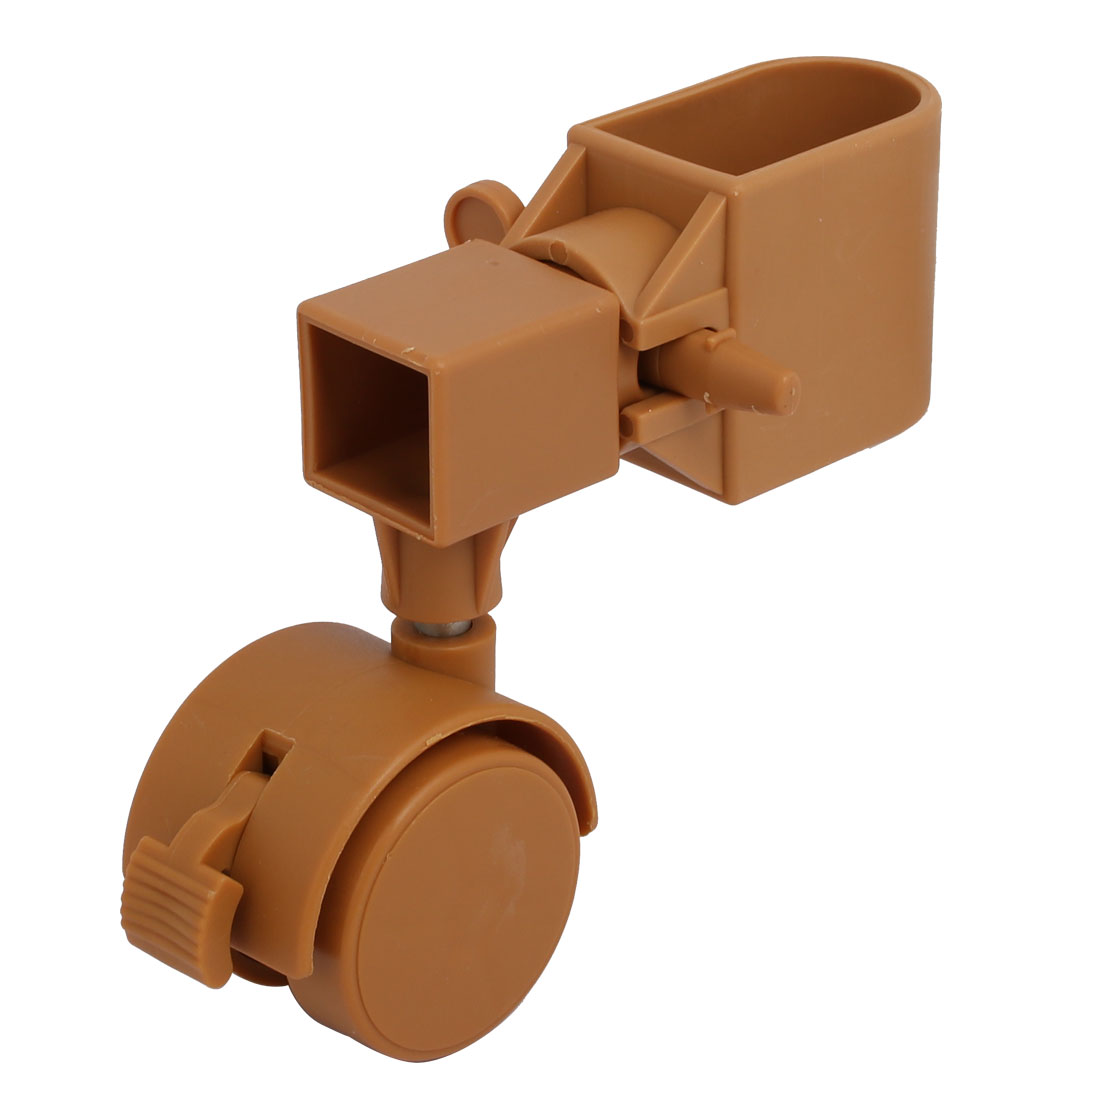 2pcs 1.5-inch Dia Plastic Swivel Caster Wheel  Fittings w Brake - image 1 of 4